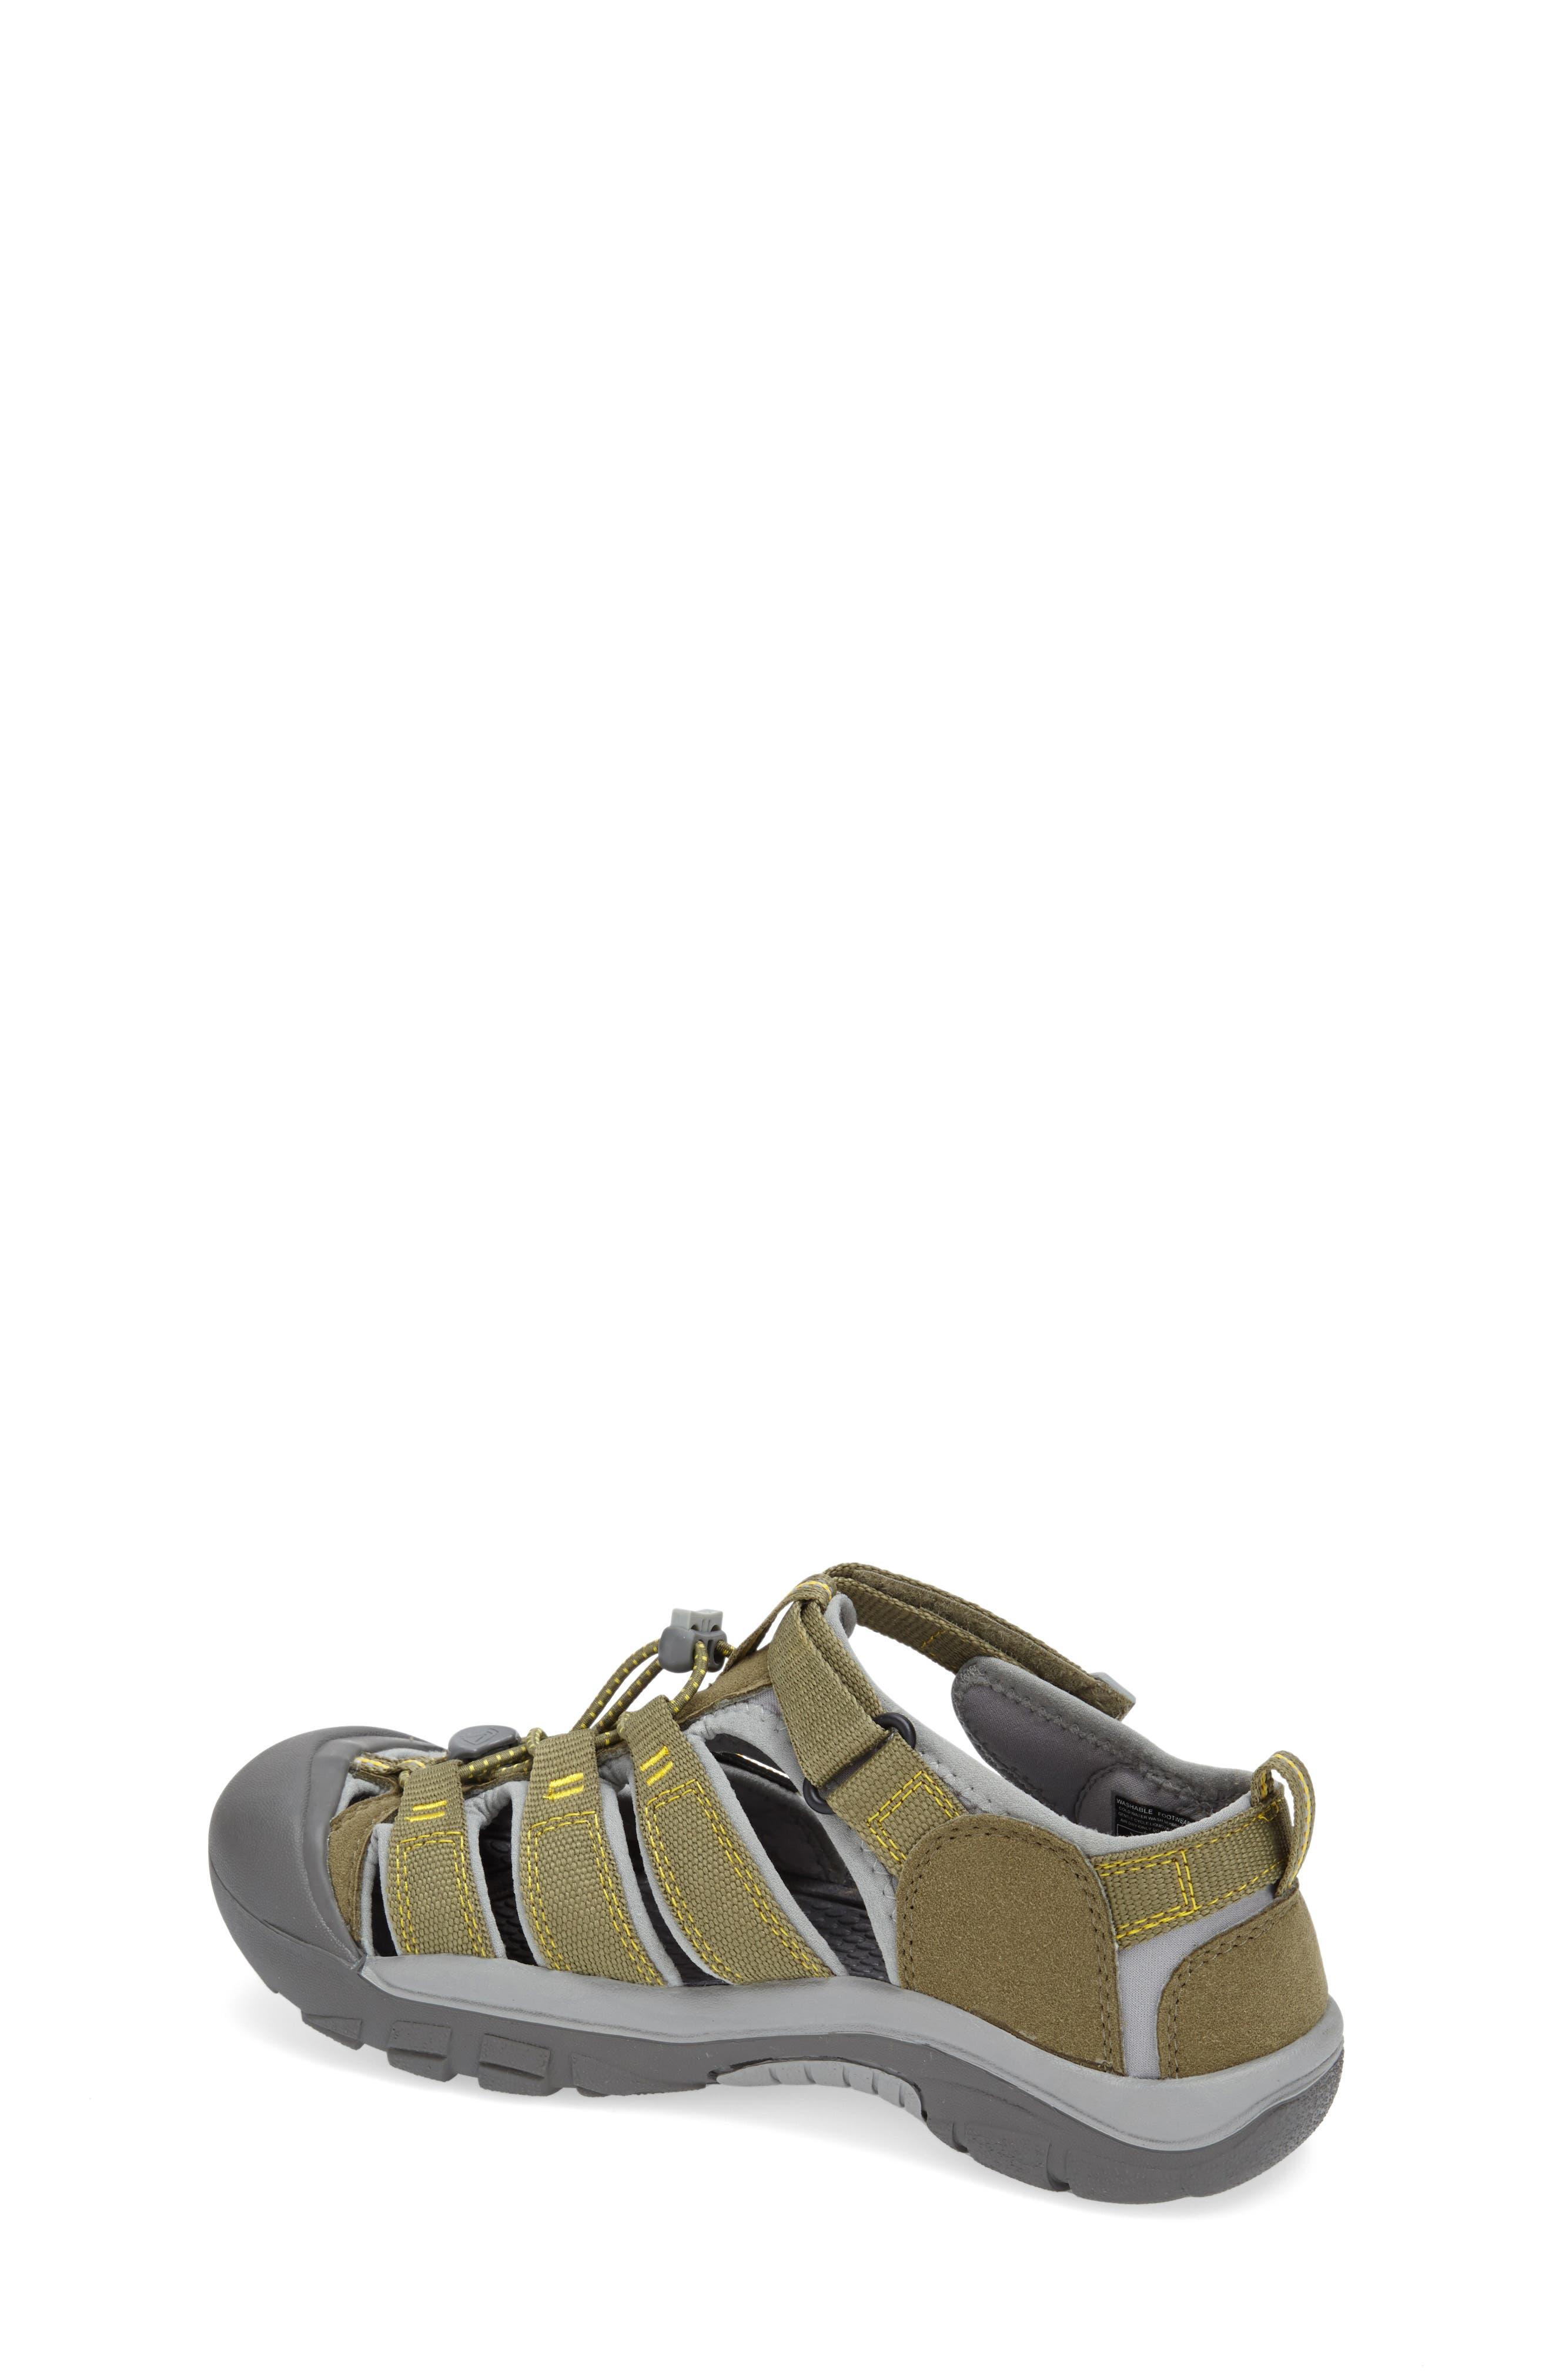 'Newport H2' Water Friendly Sandal,                             Alternate thumbnail 81, color,